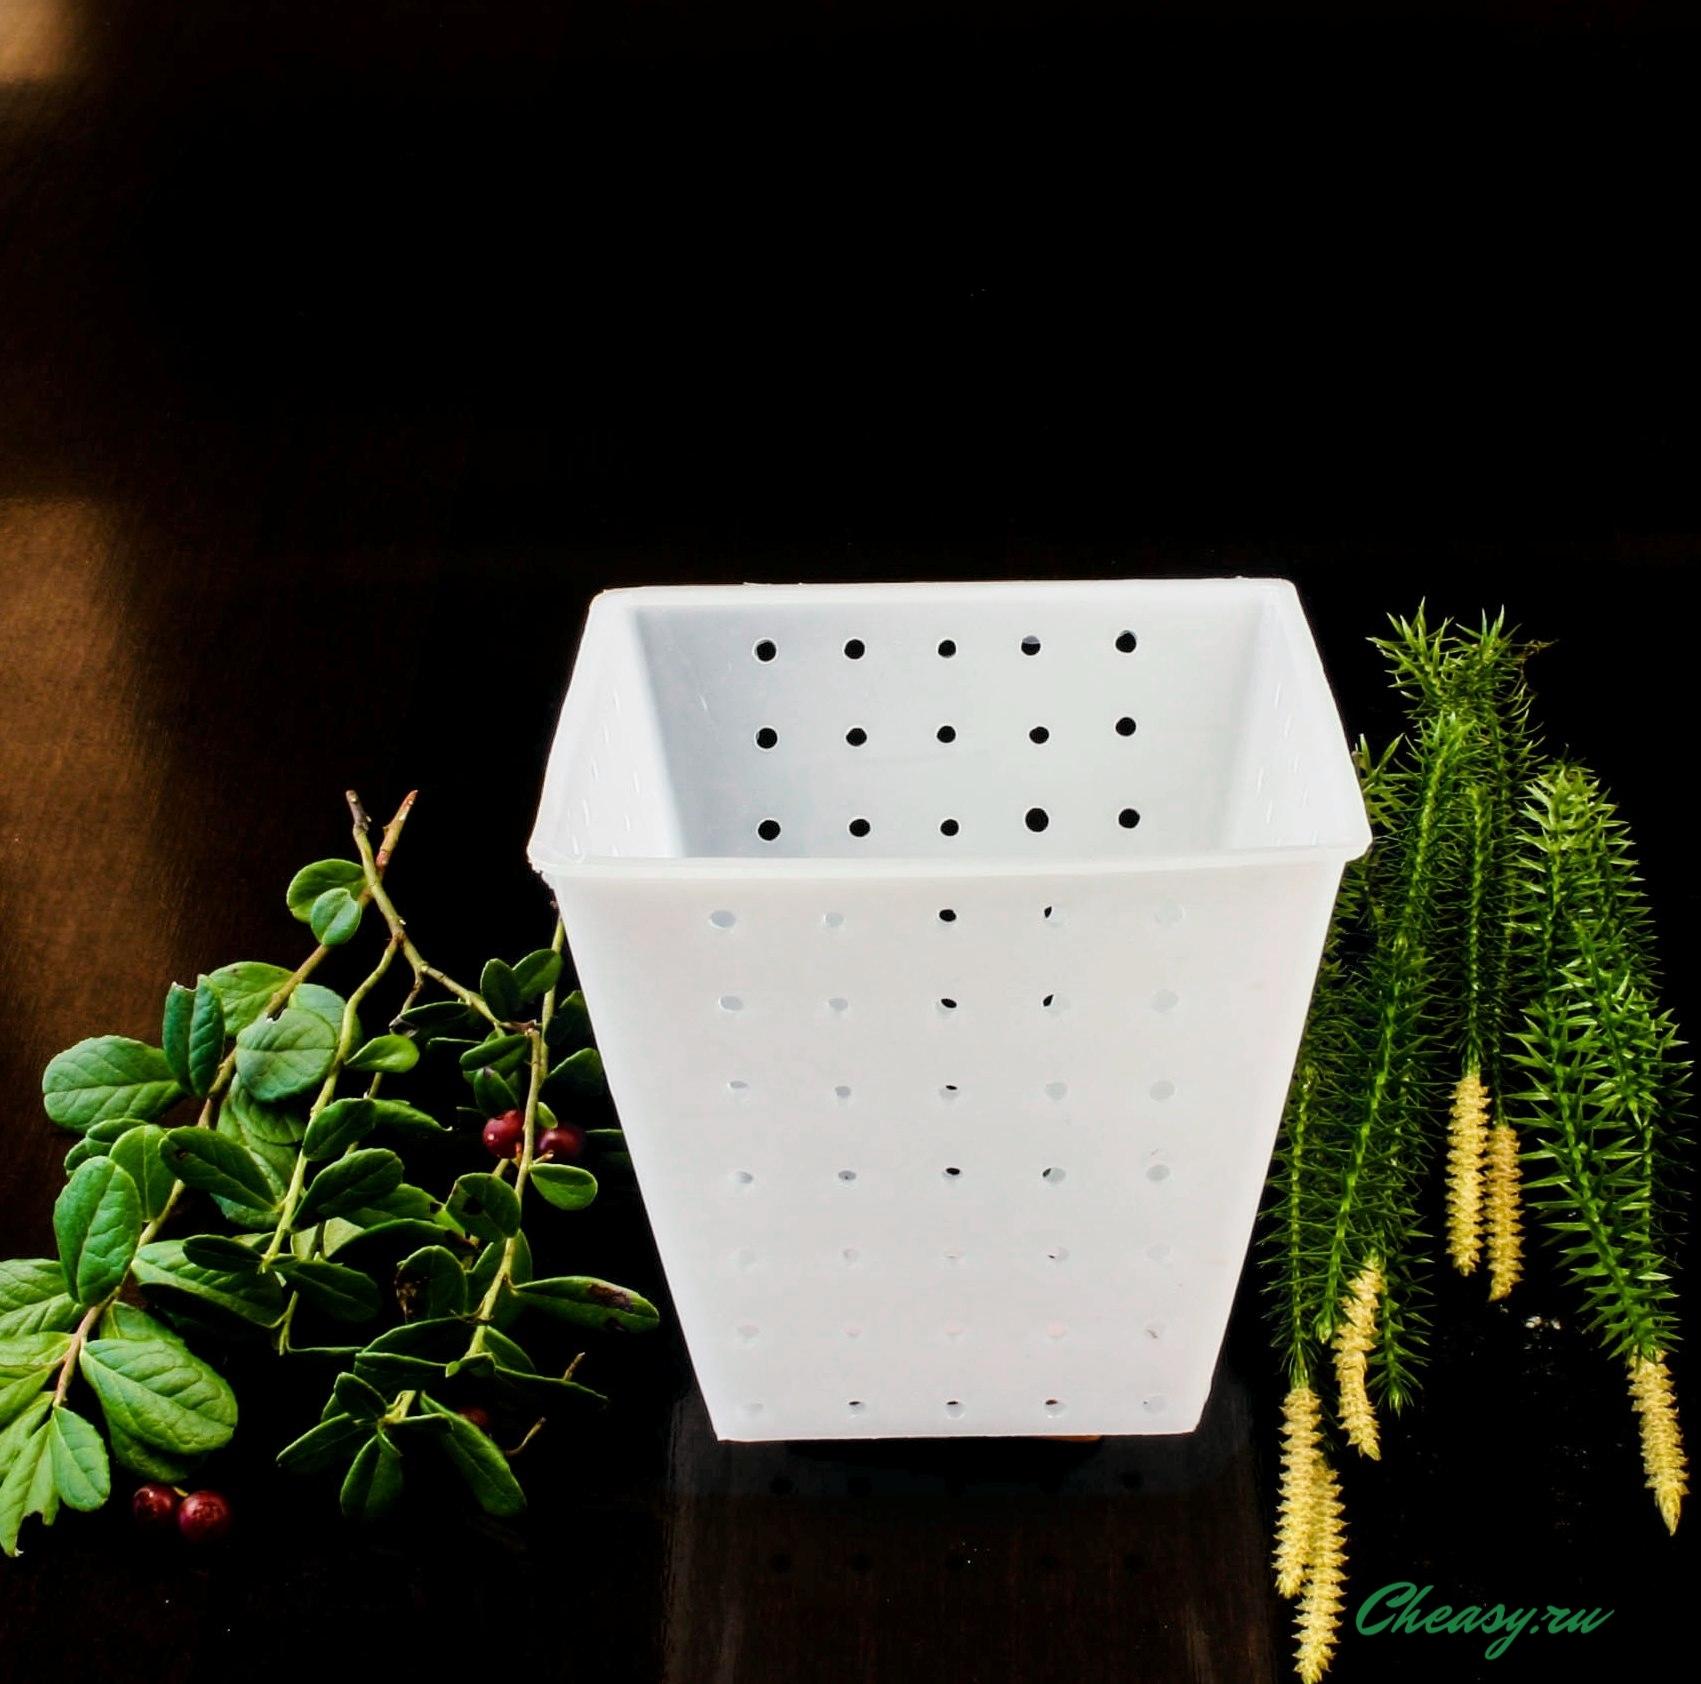 форма для сыра Валансе (Valencay) пирамида